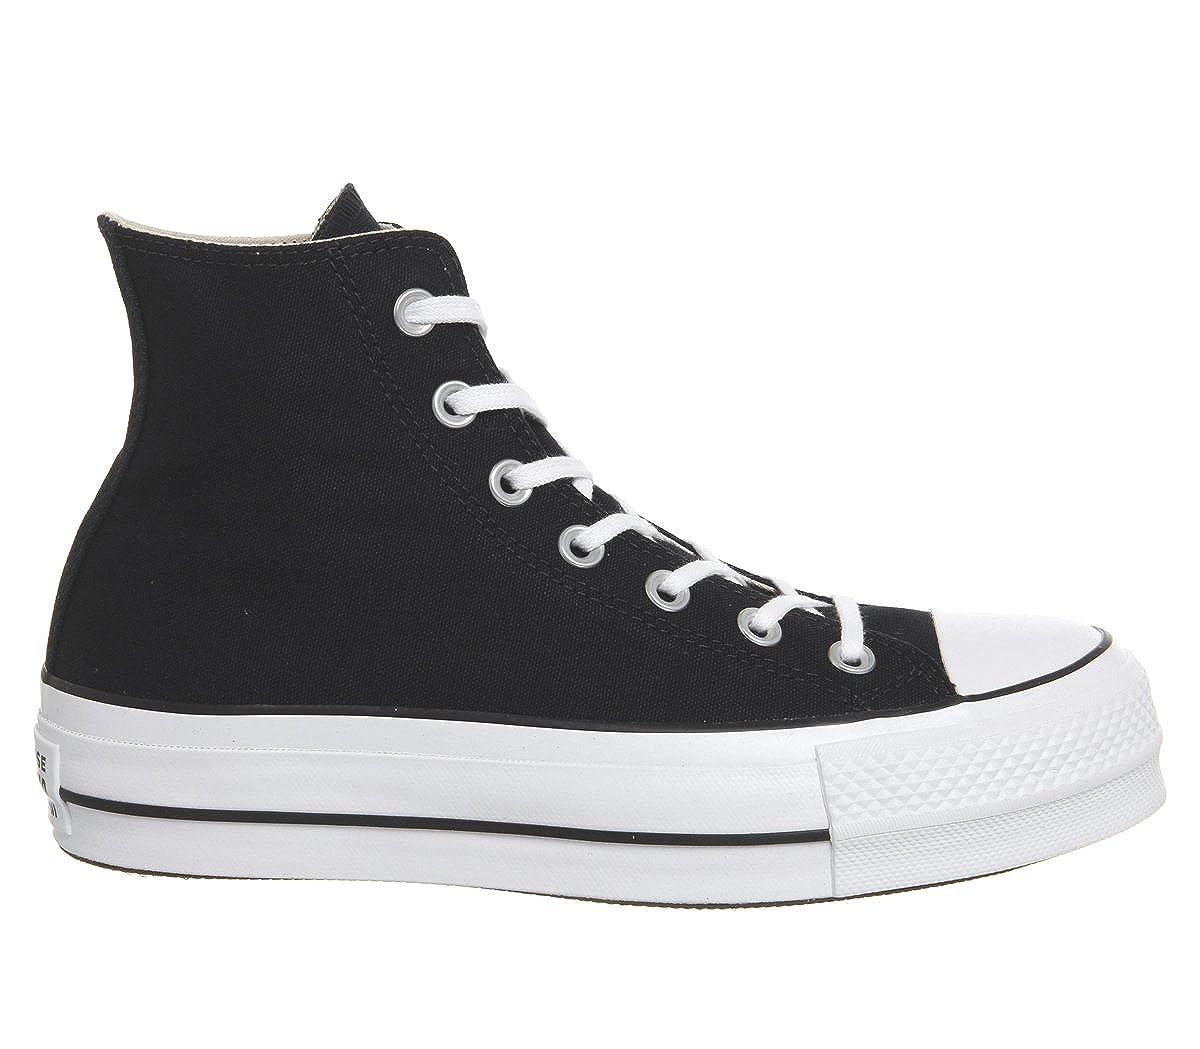 Converse CTAS Lift Hi Black White, Zapatillas Altas Unisex Adulto